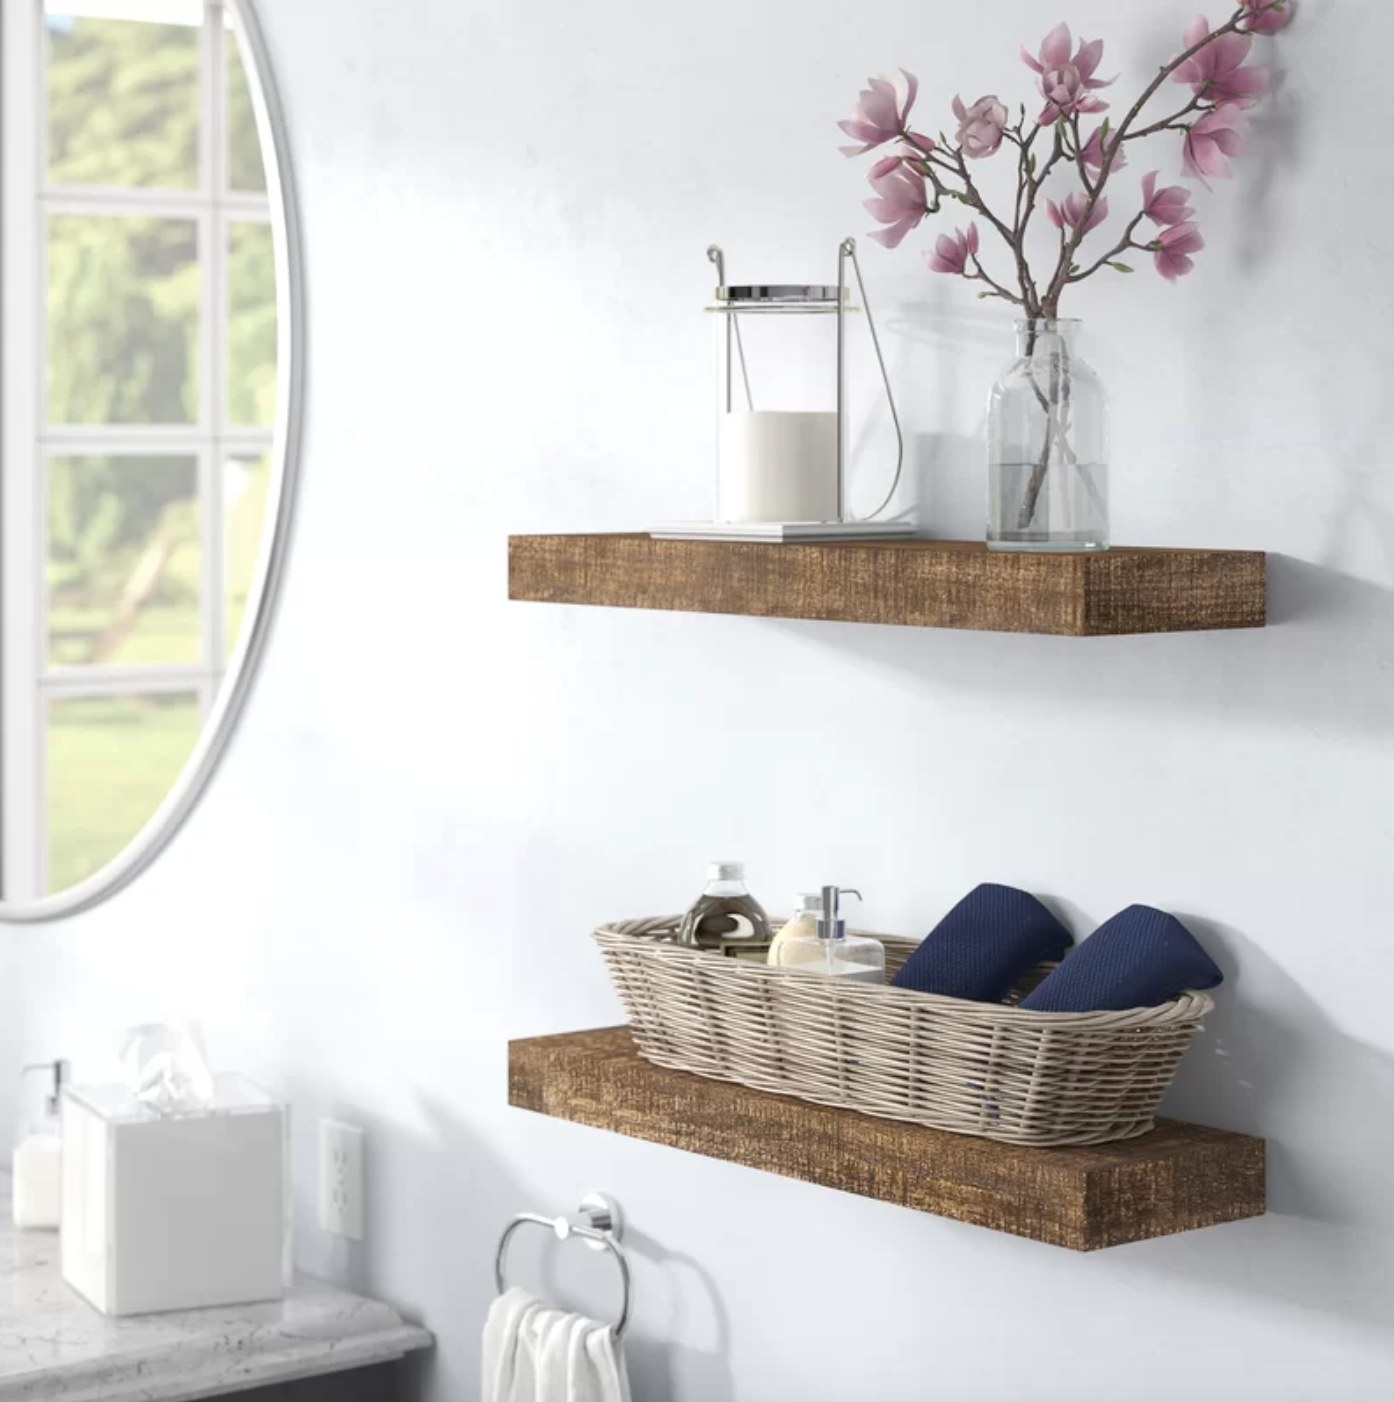 The set of wood shelves in dark walnut